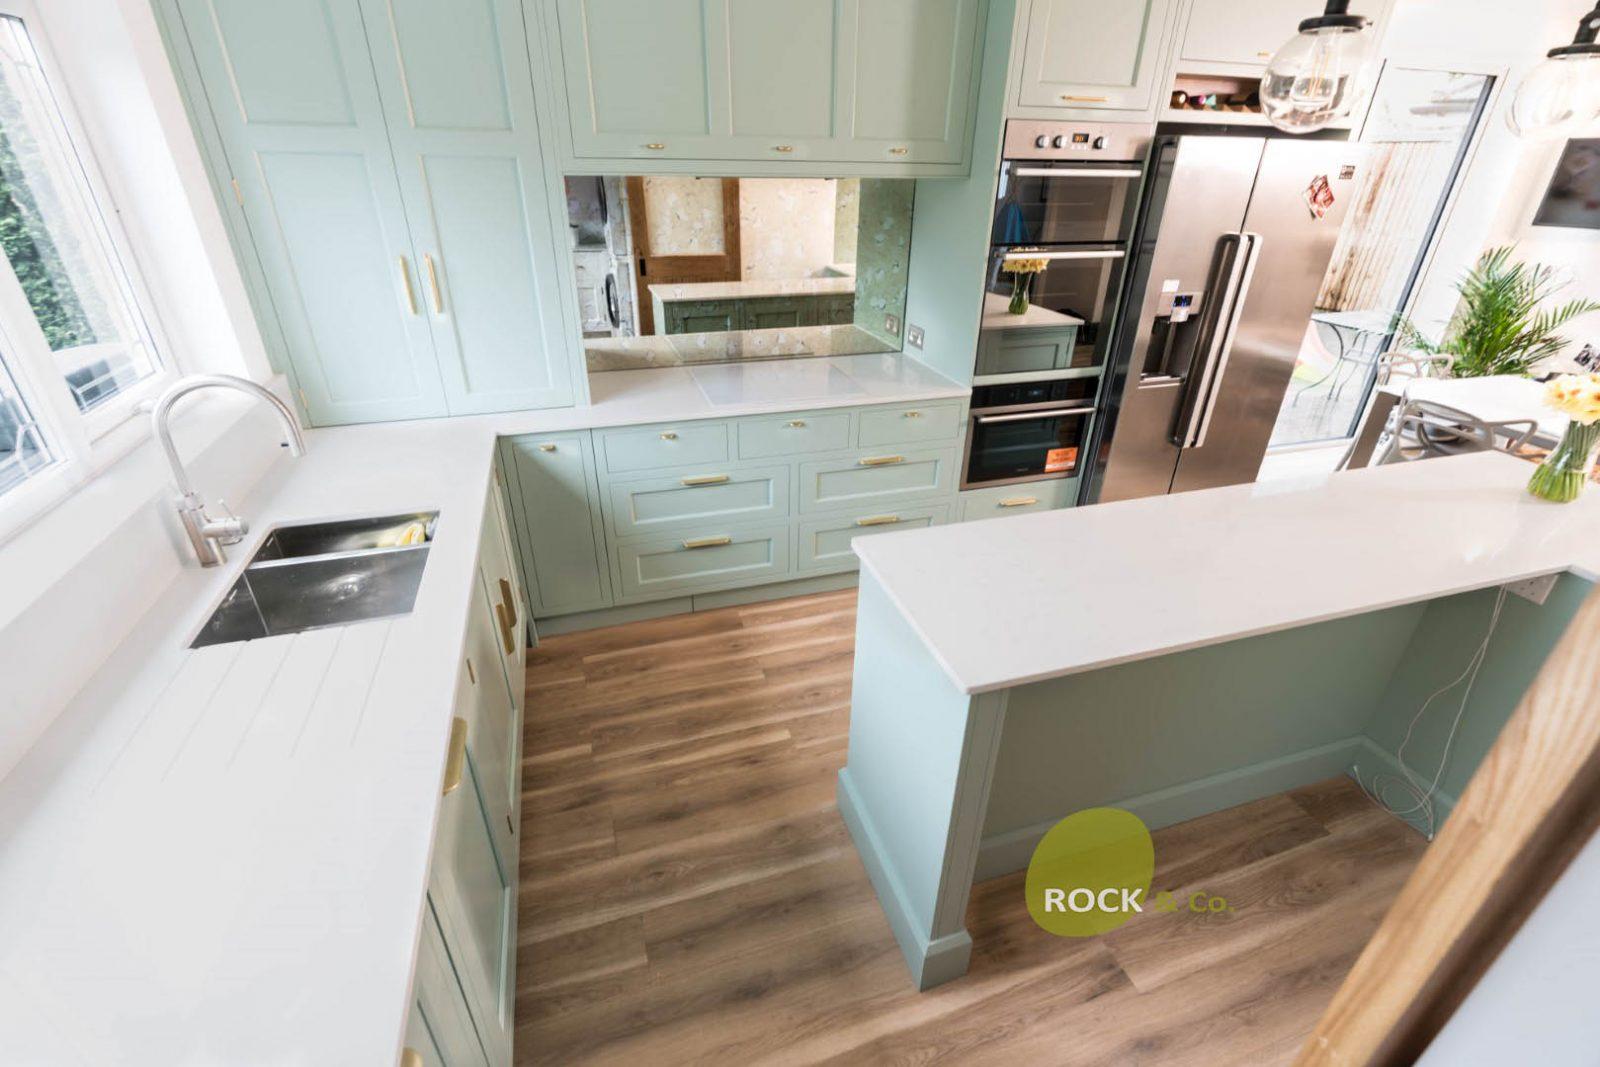 Kitchen of the week… Located in Borehamwood, Herts, showcasing the Bianco Carrina